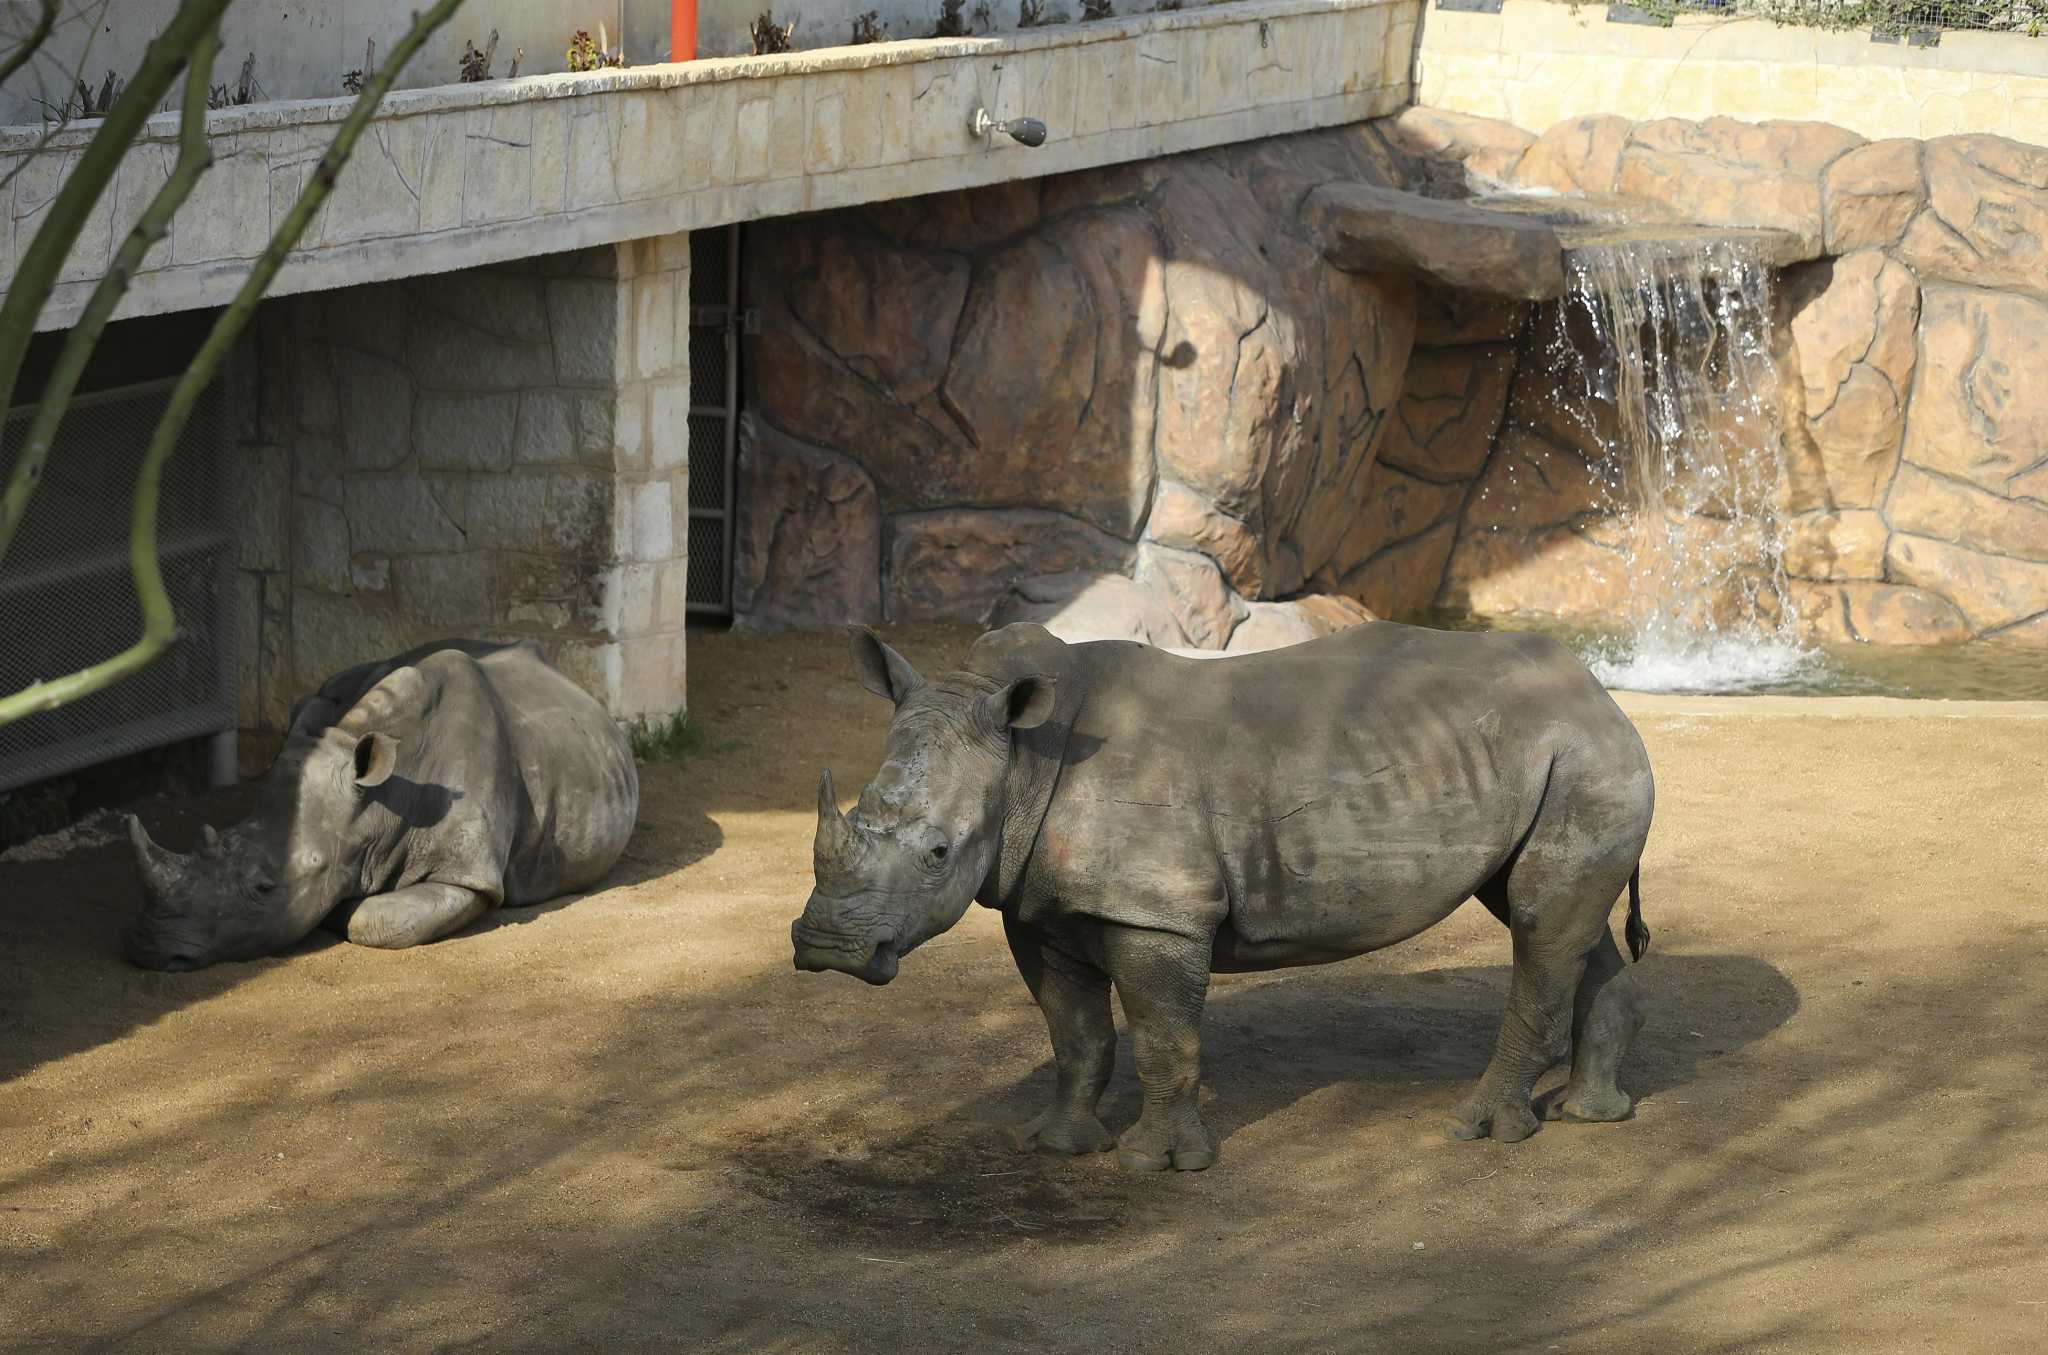 New Rhino Habitat At San Antonio Zoo Offers Expanded